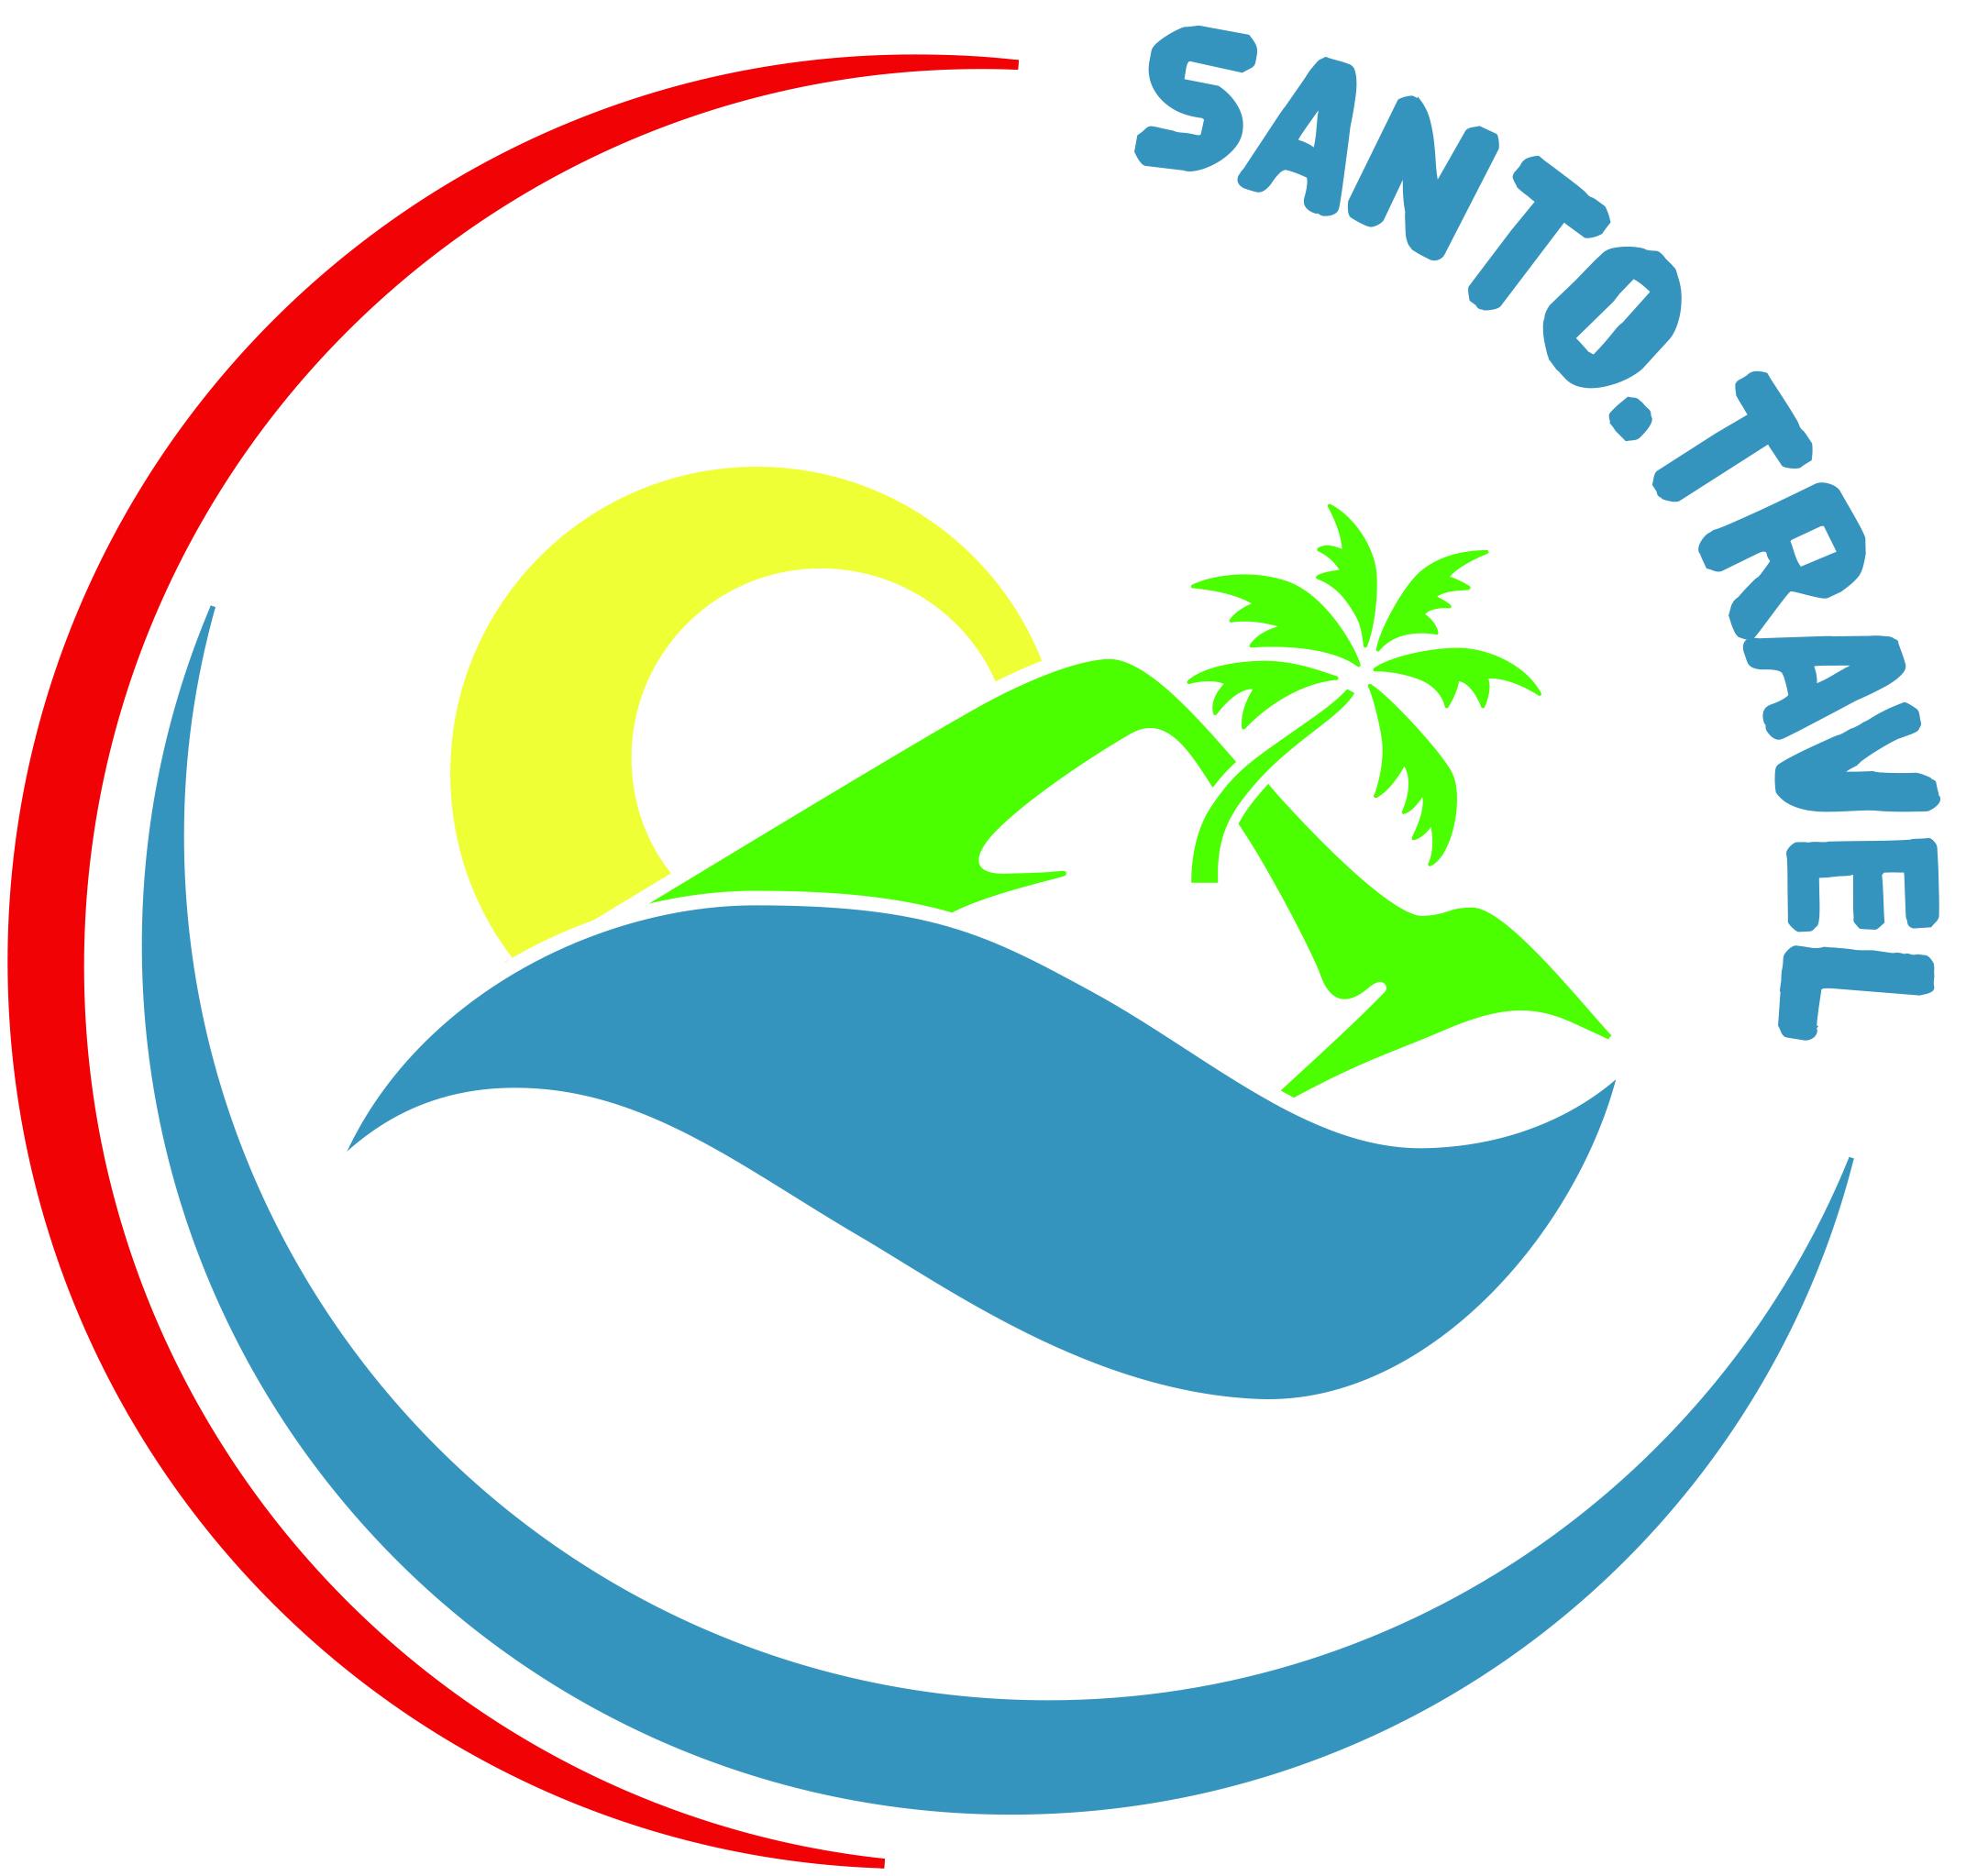 logo_CMYK2.jpg